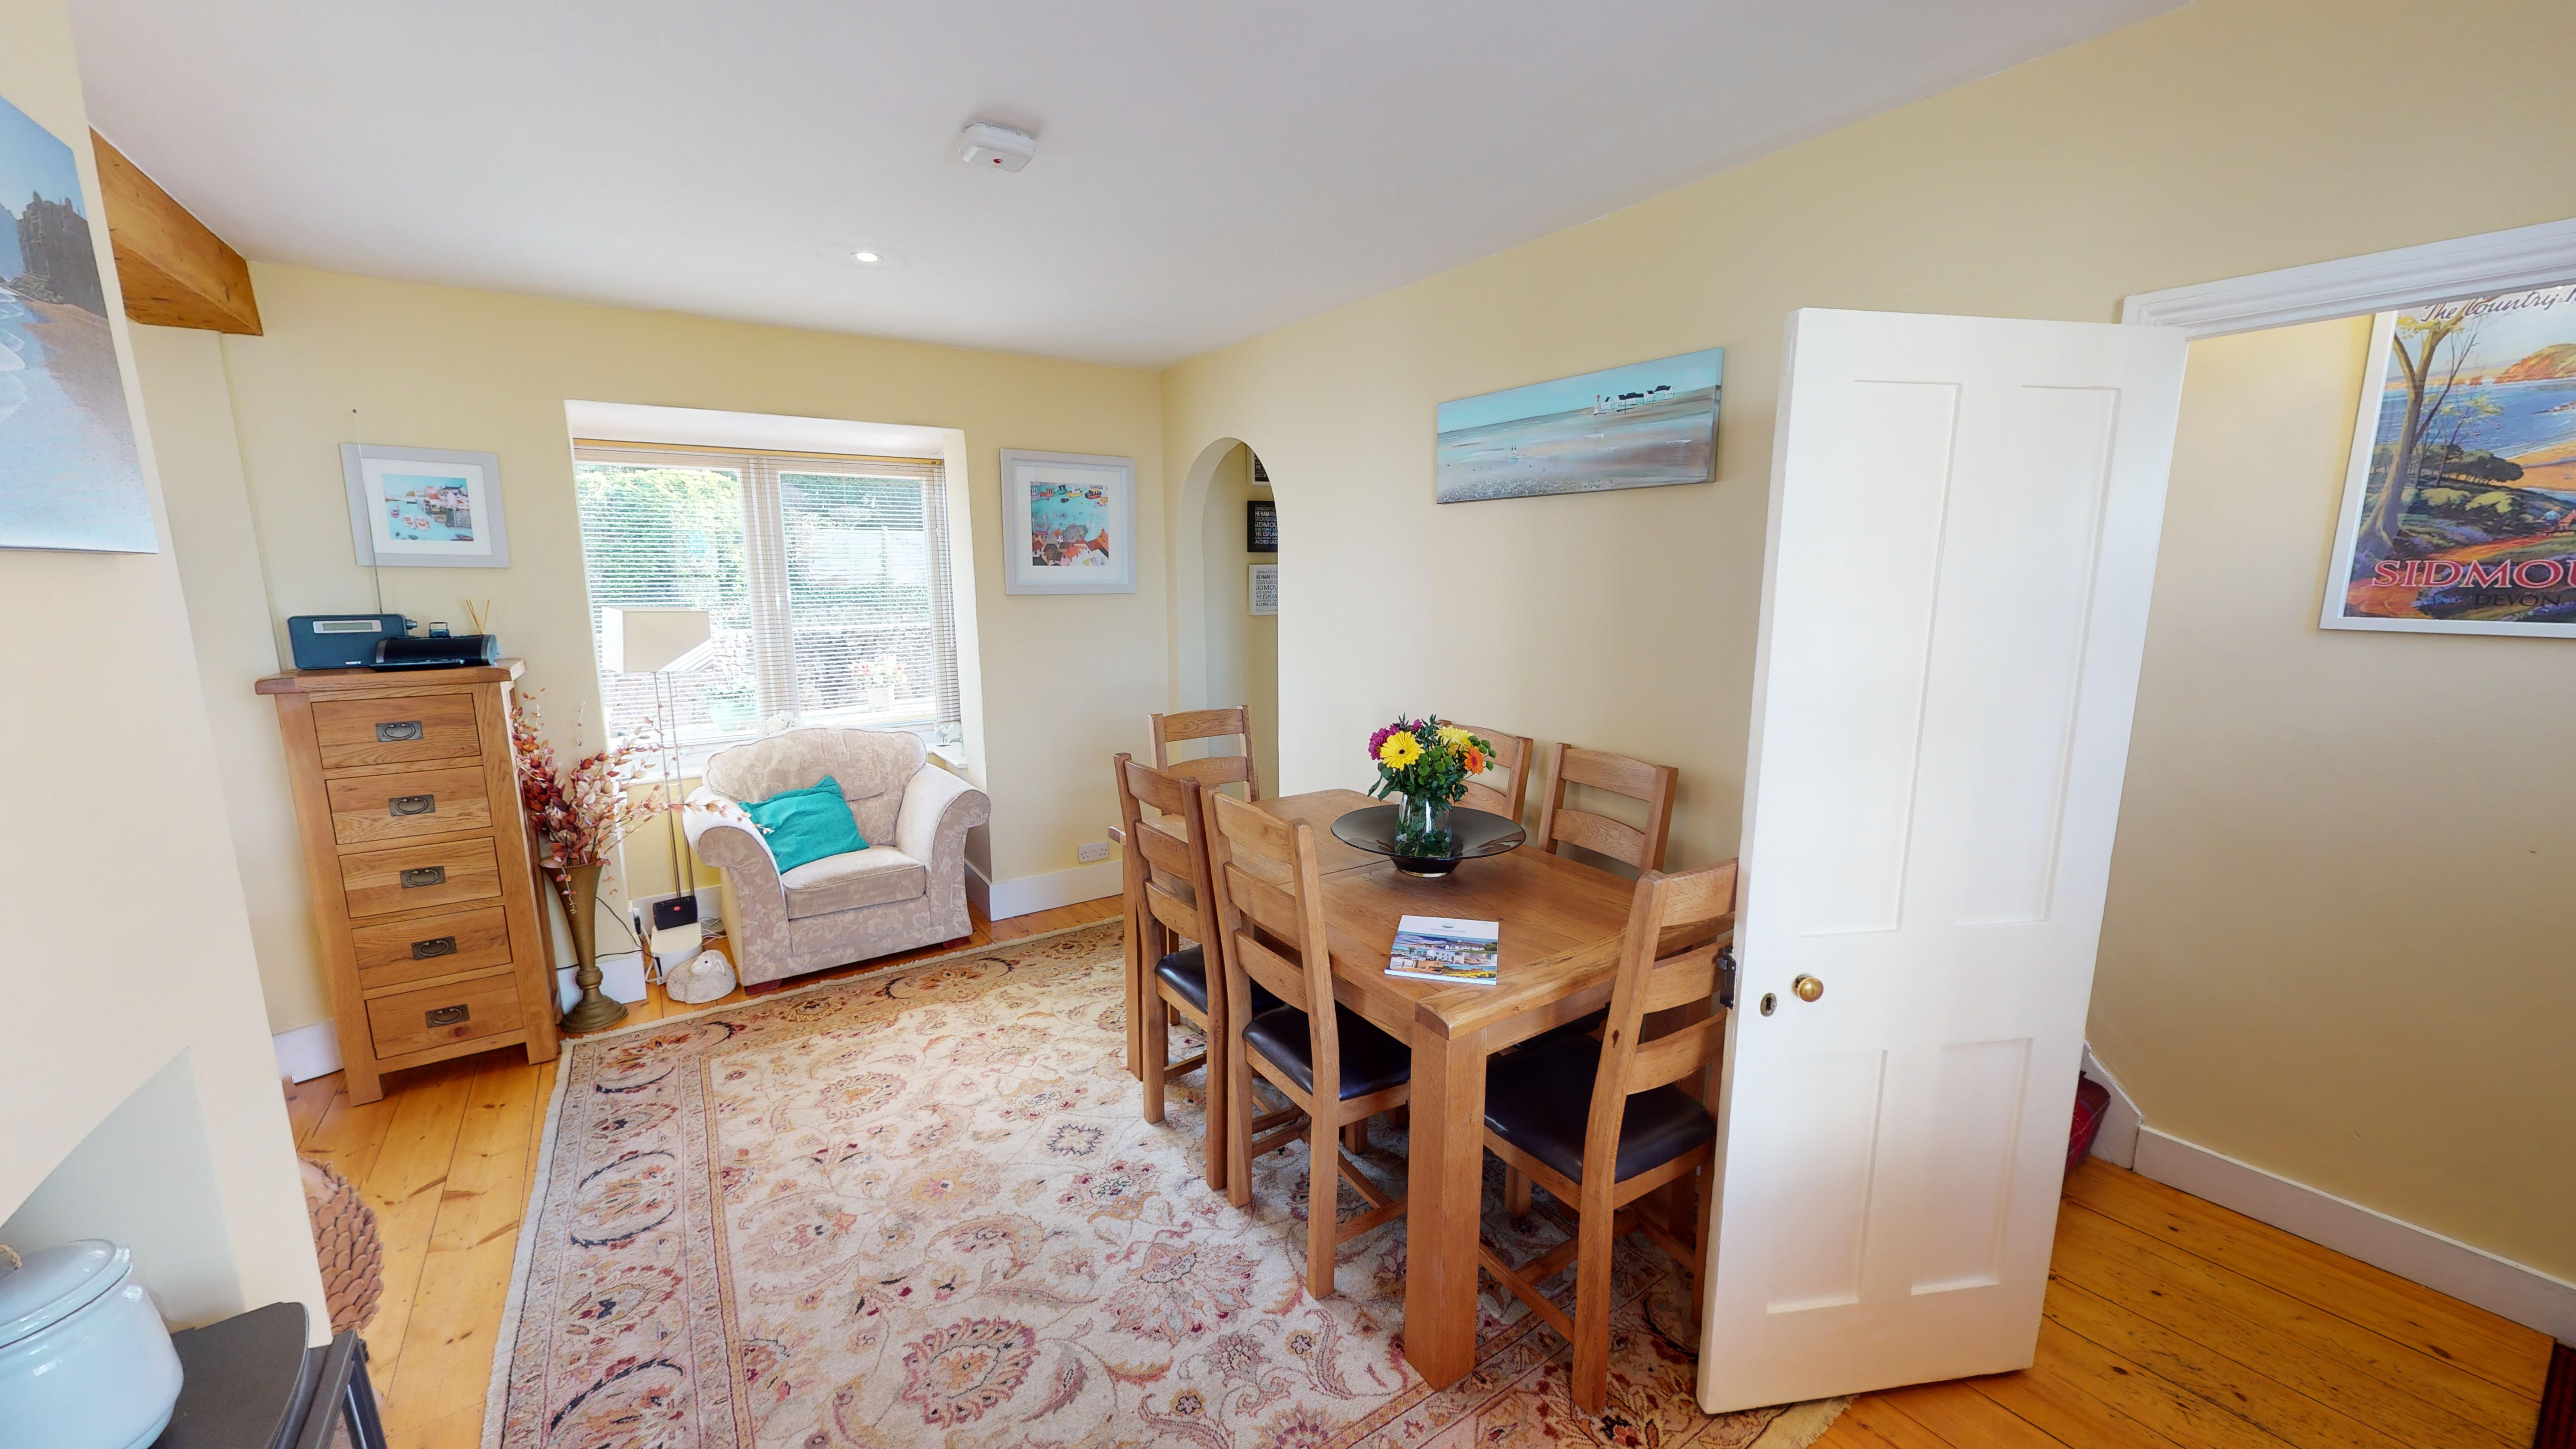 Camomile Cottage 03142020 183813